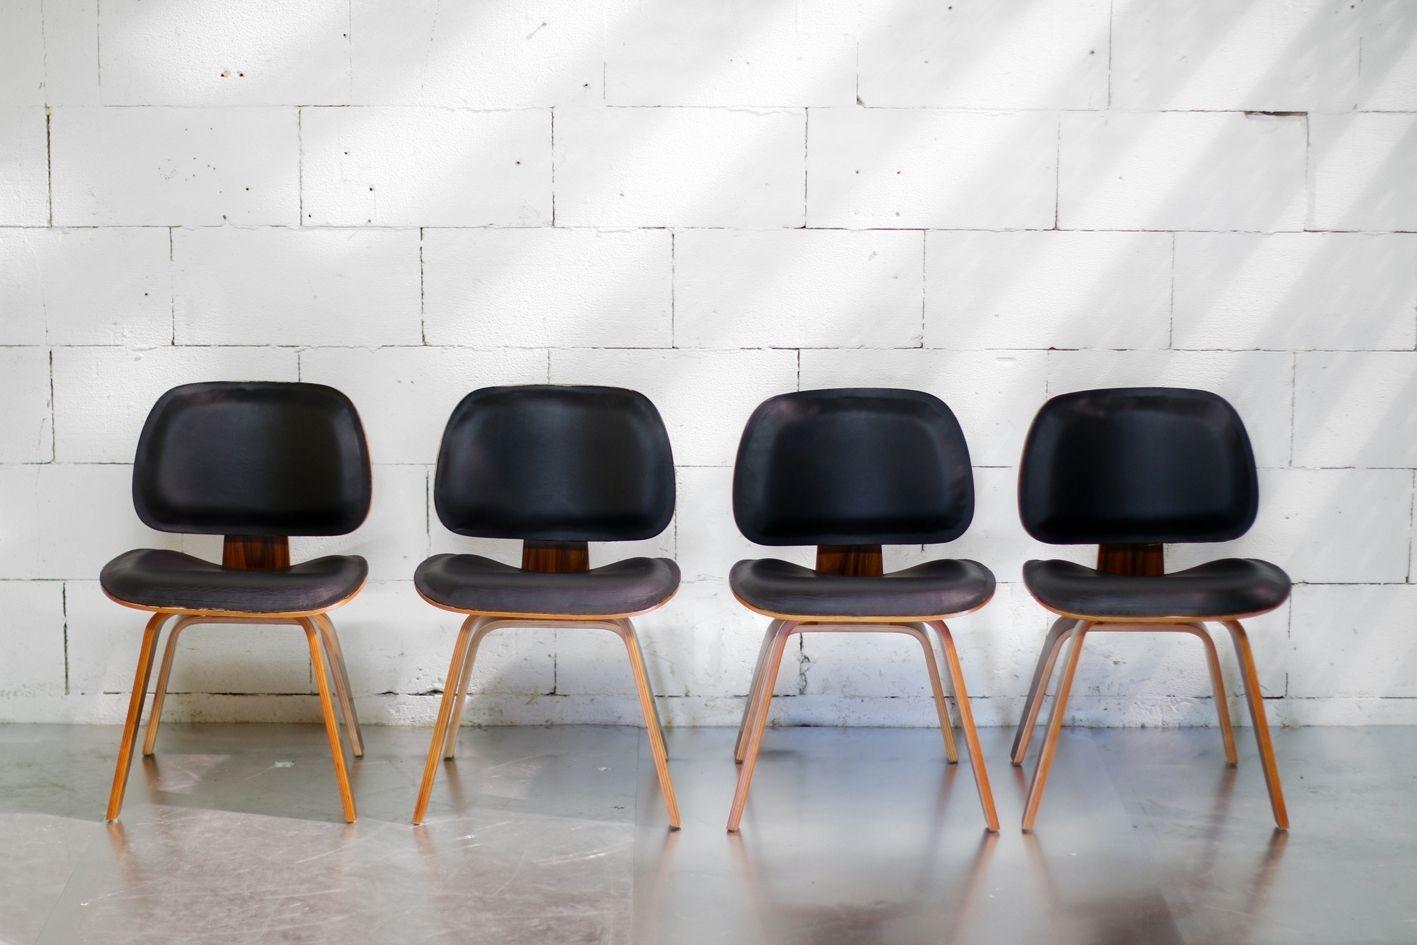 Zwarte eettafel stoelen modern plywood en zwart skai eames lookalike